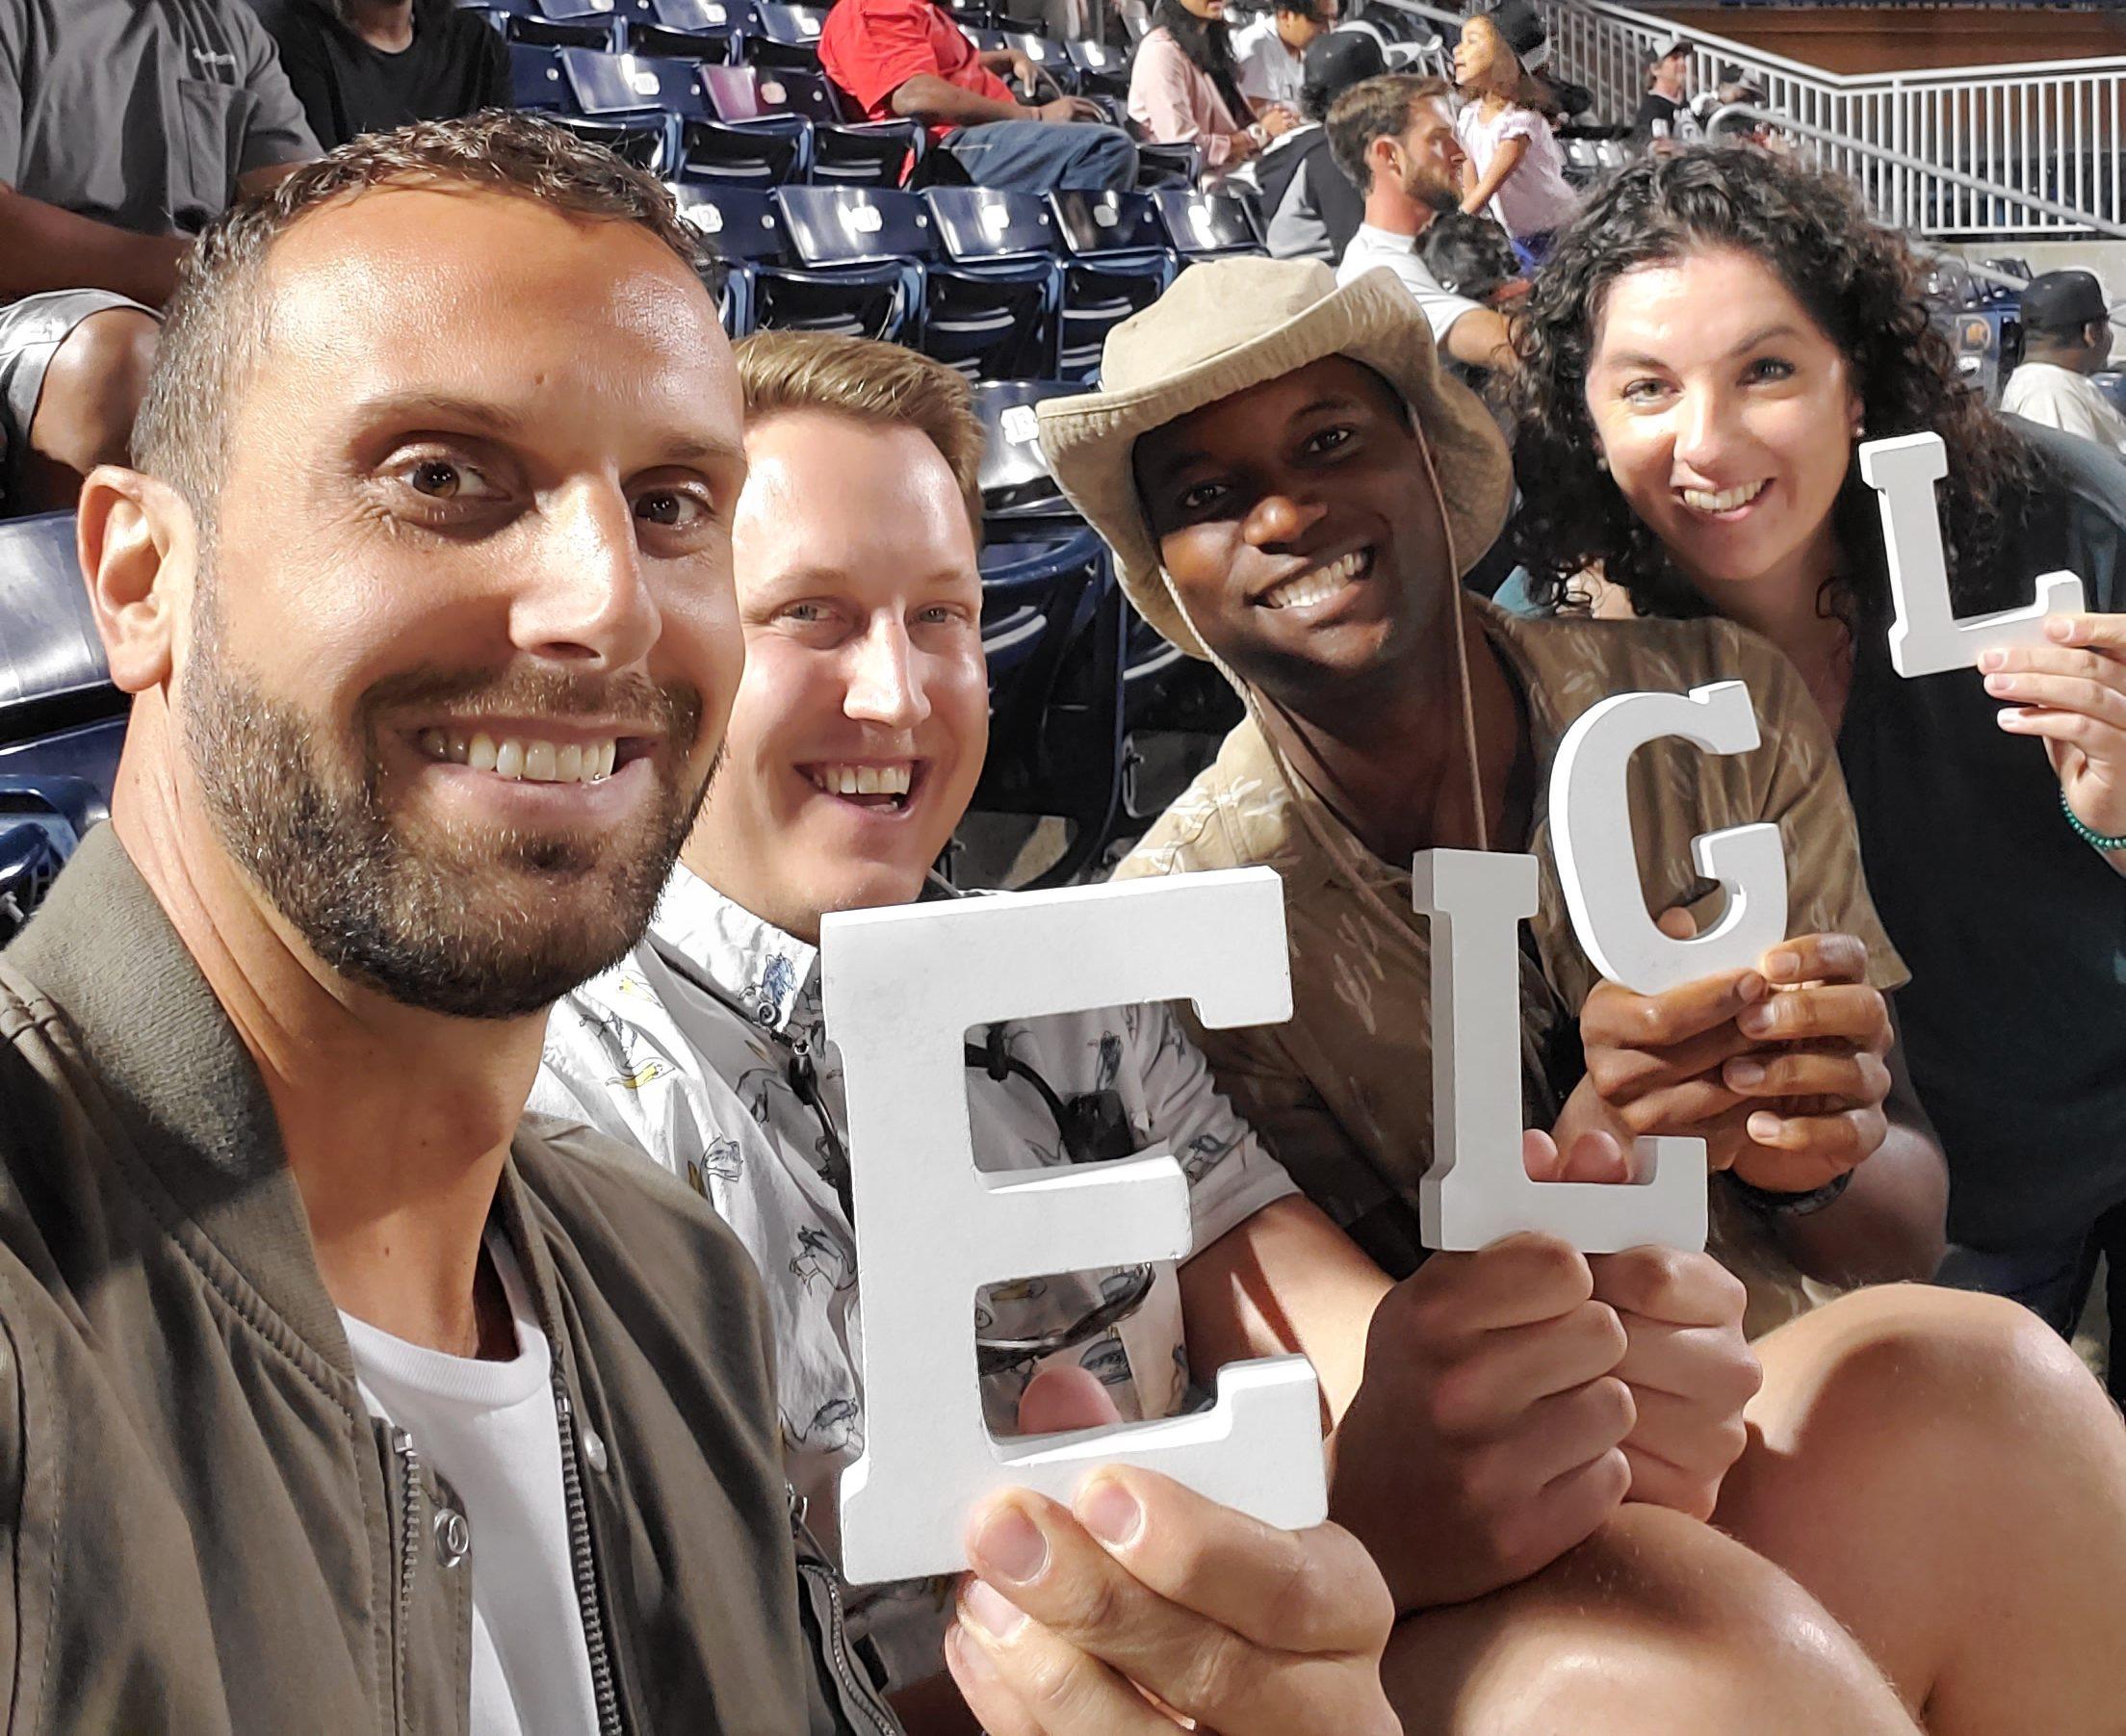 ELGL Letters at Baseball